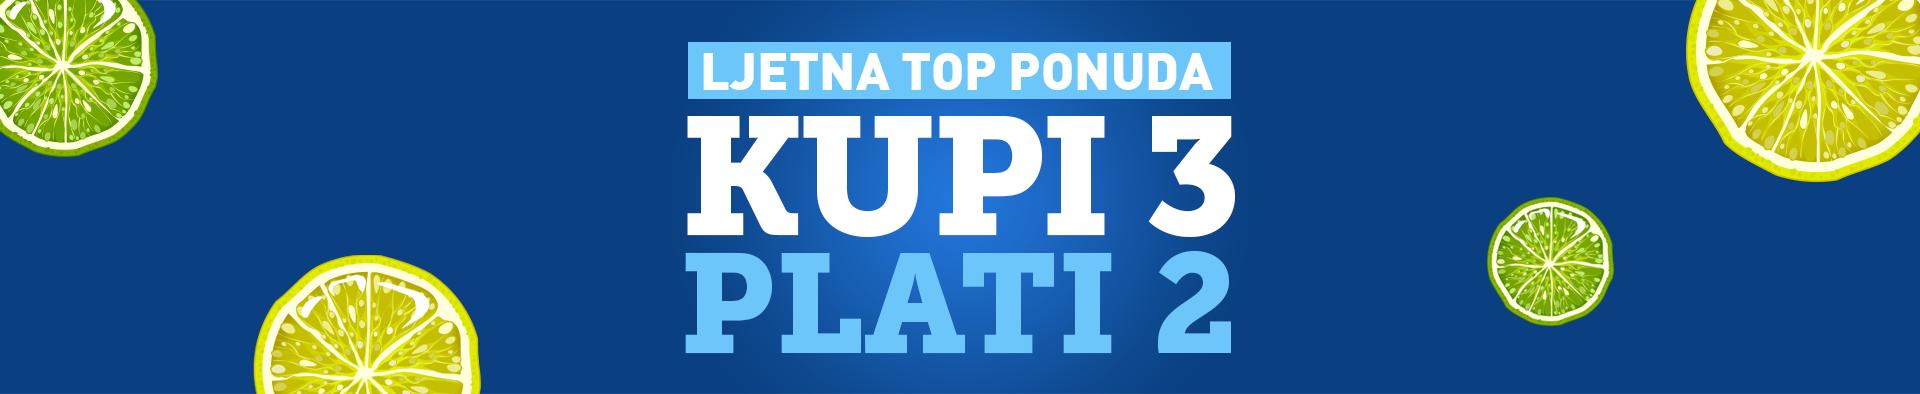 apolonia_kupi-3-plati-2_akcija_2018